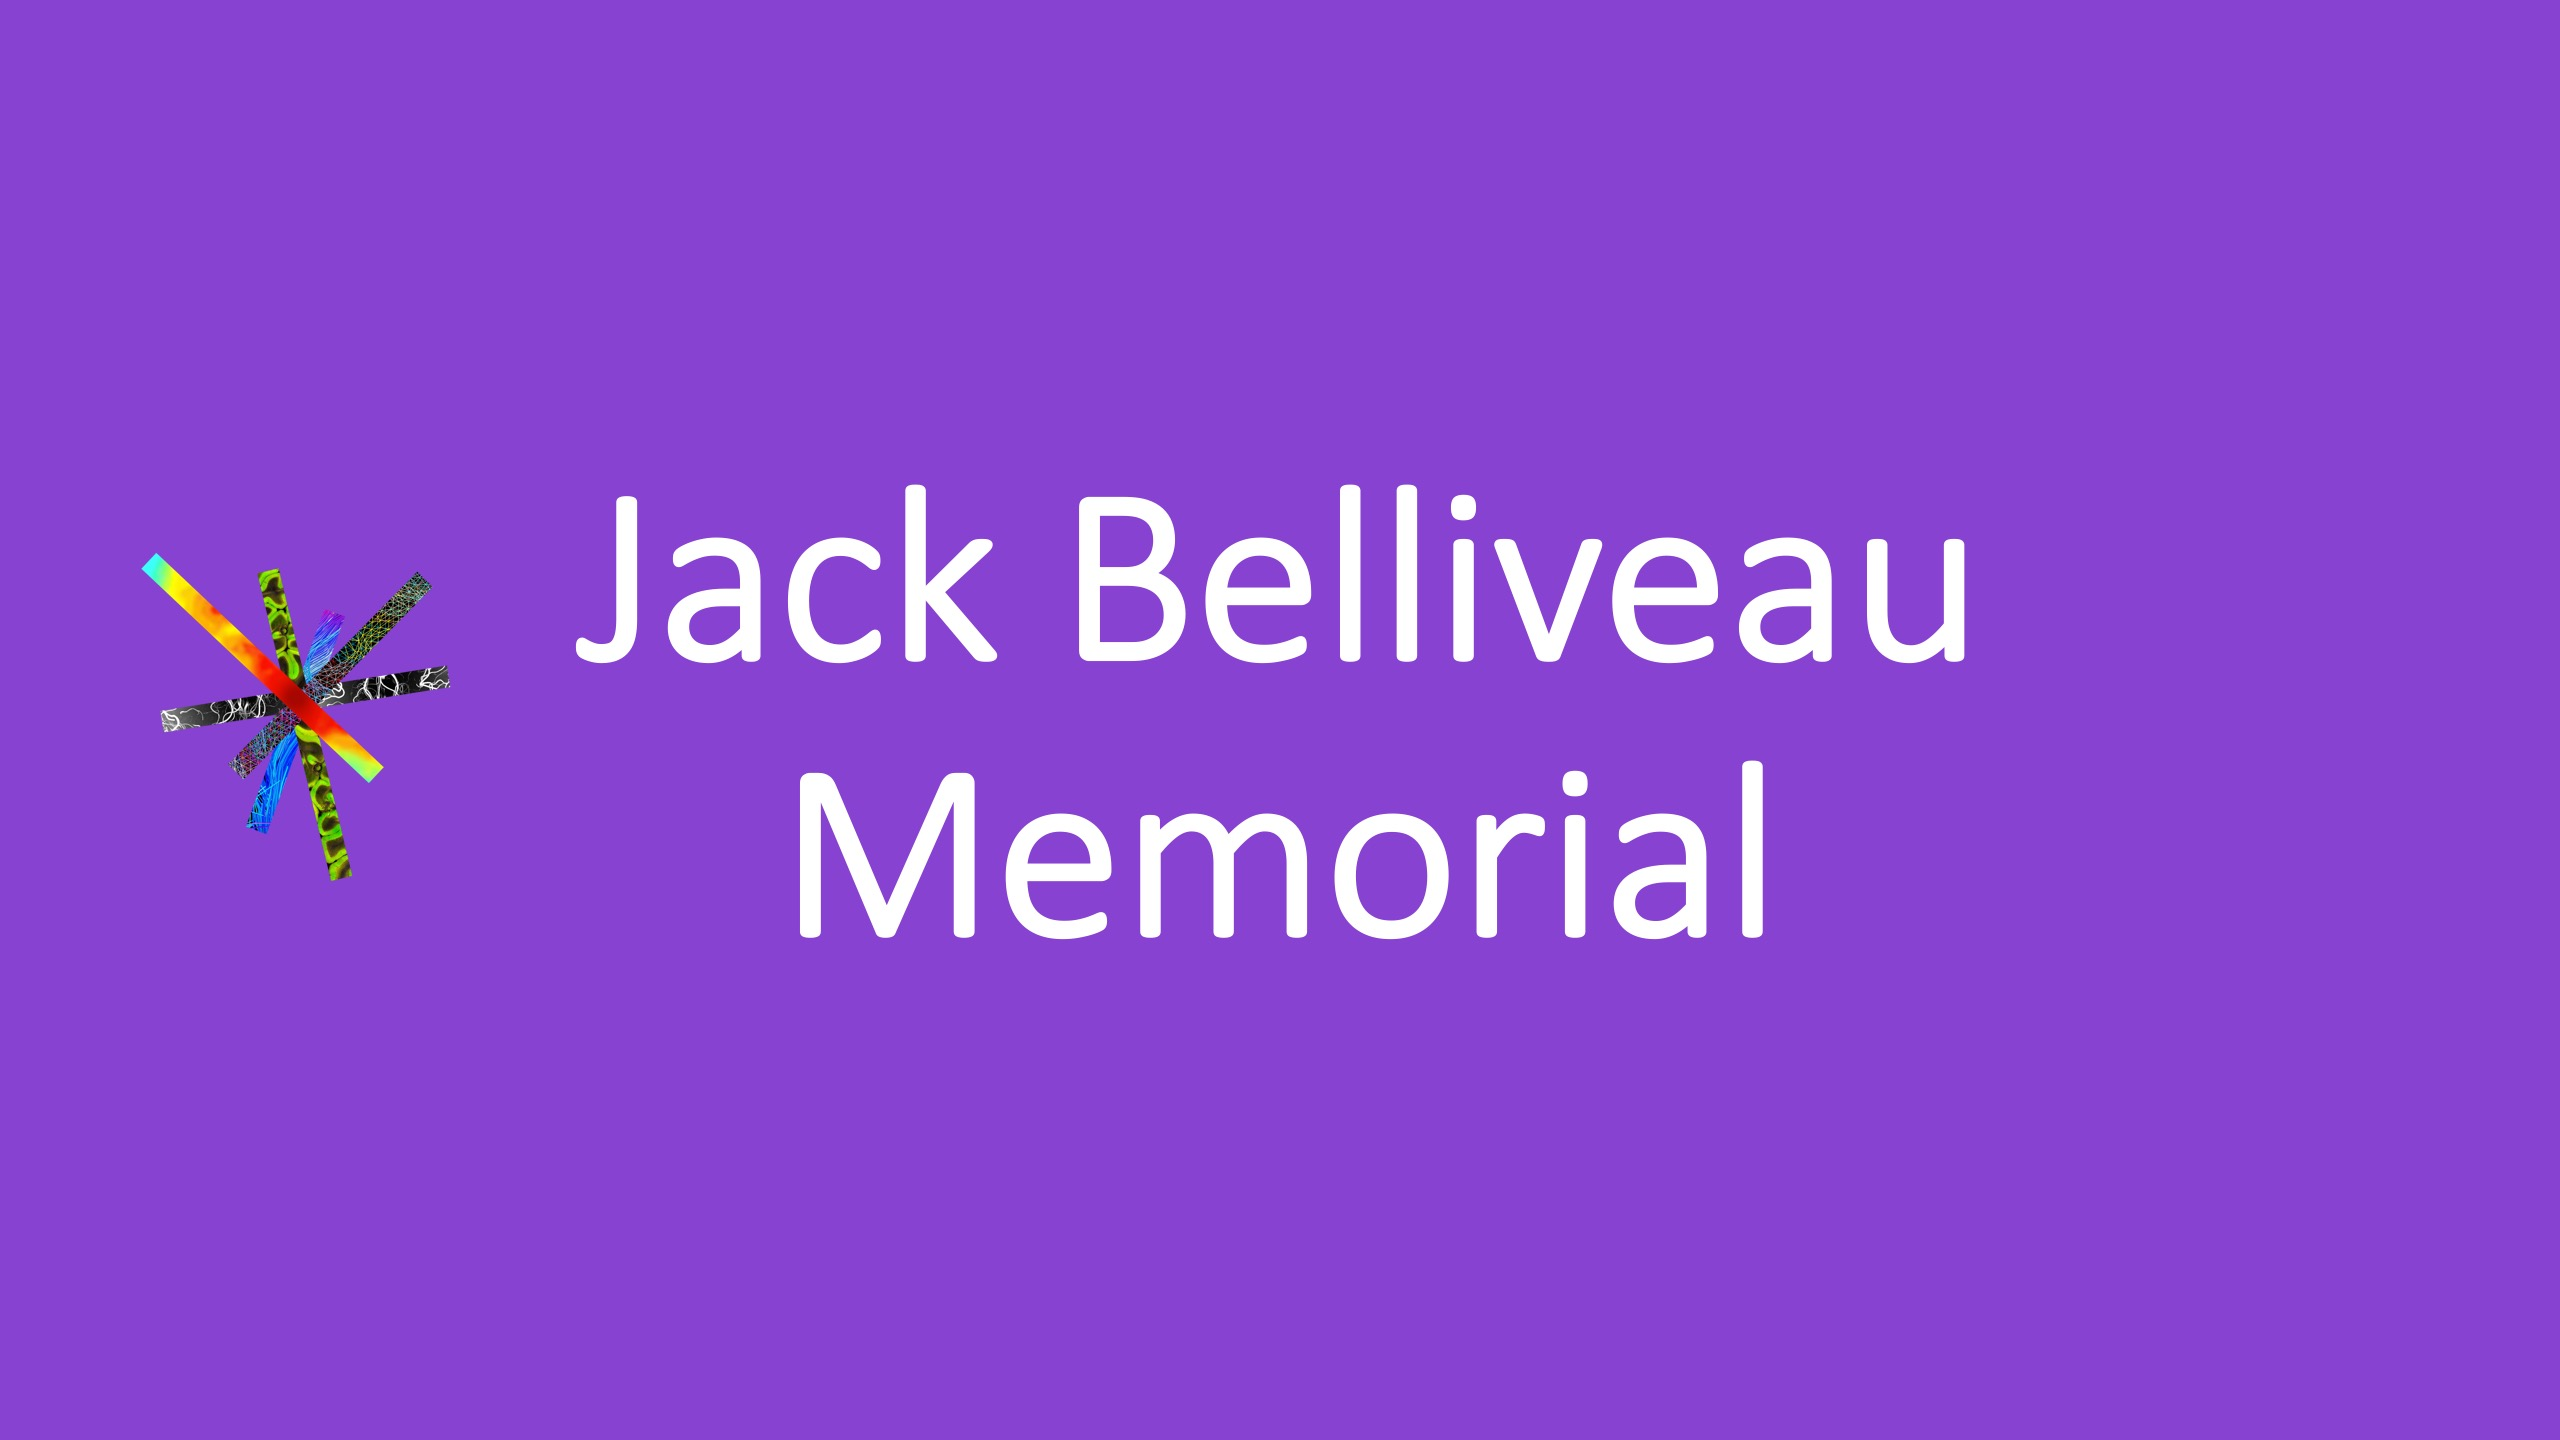 Jack Belliveau Memorial